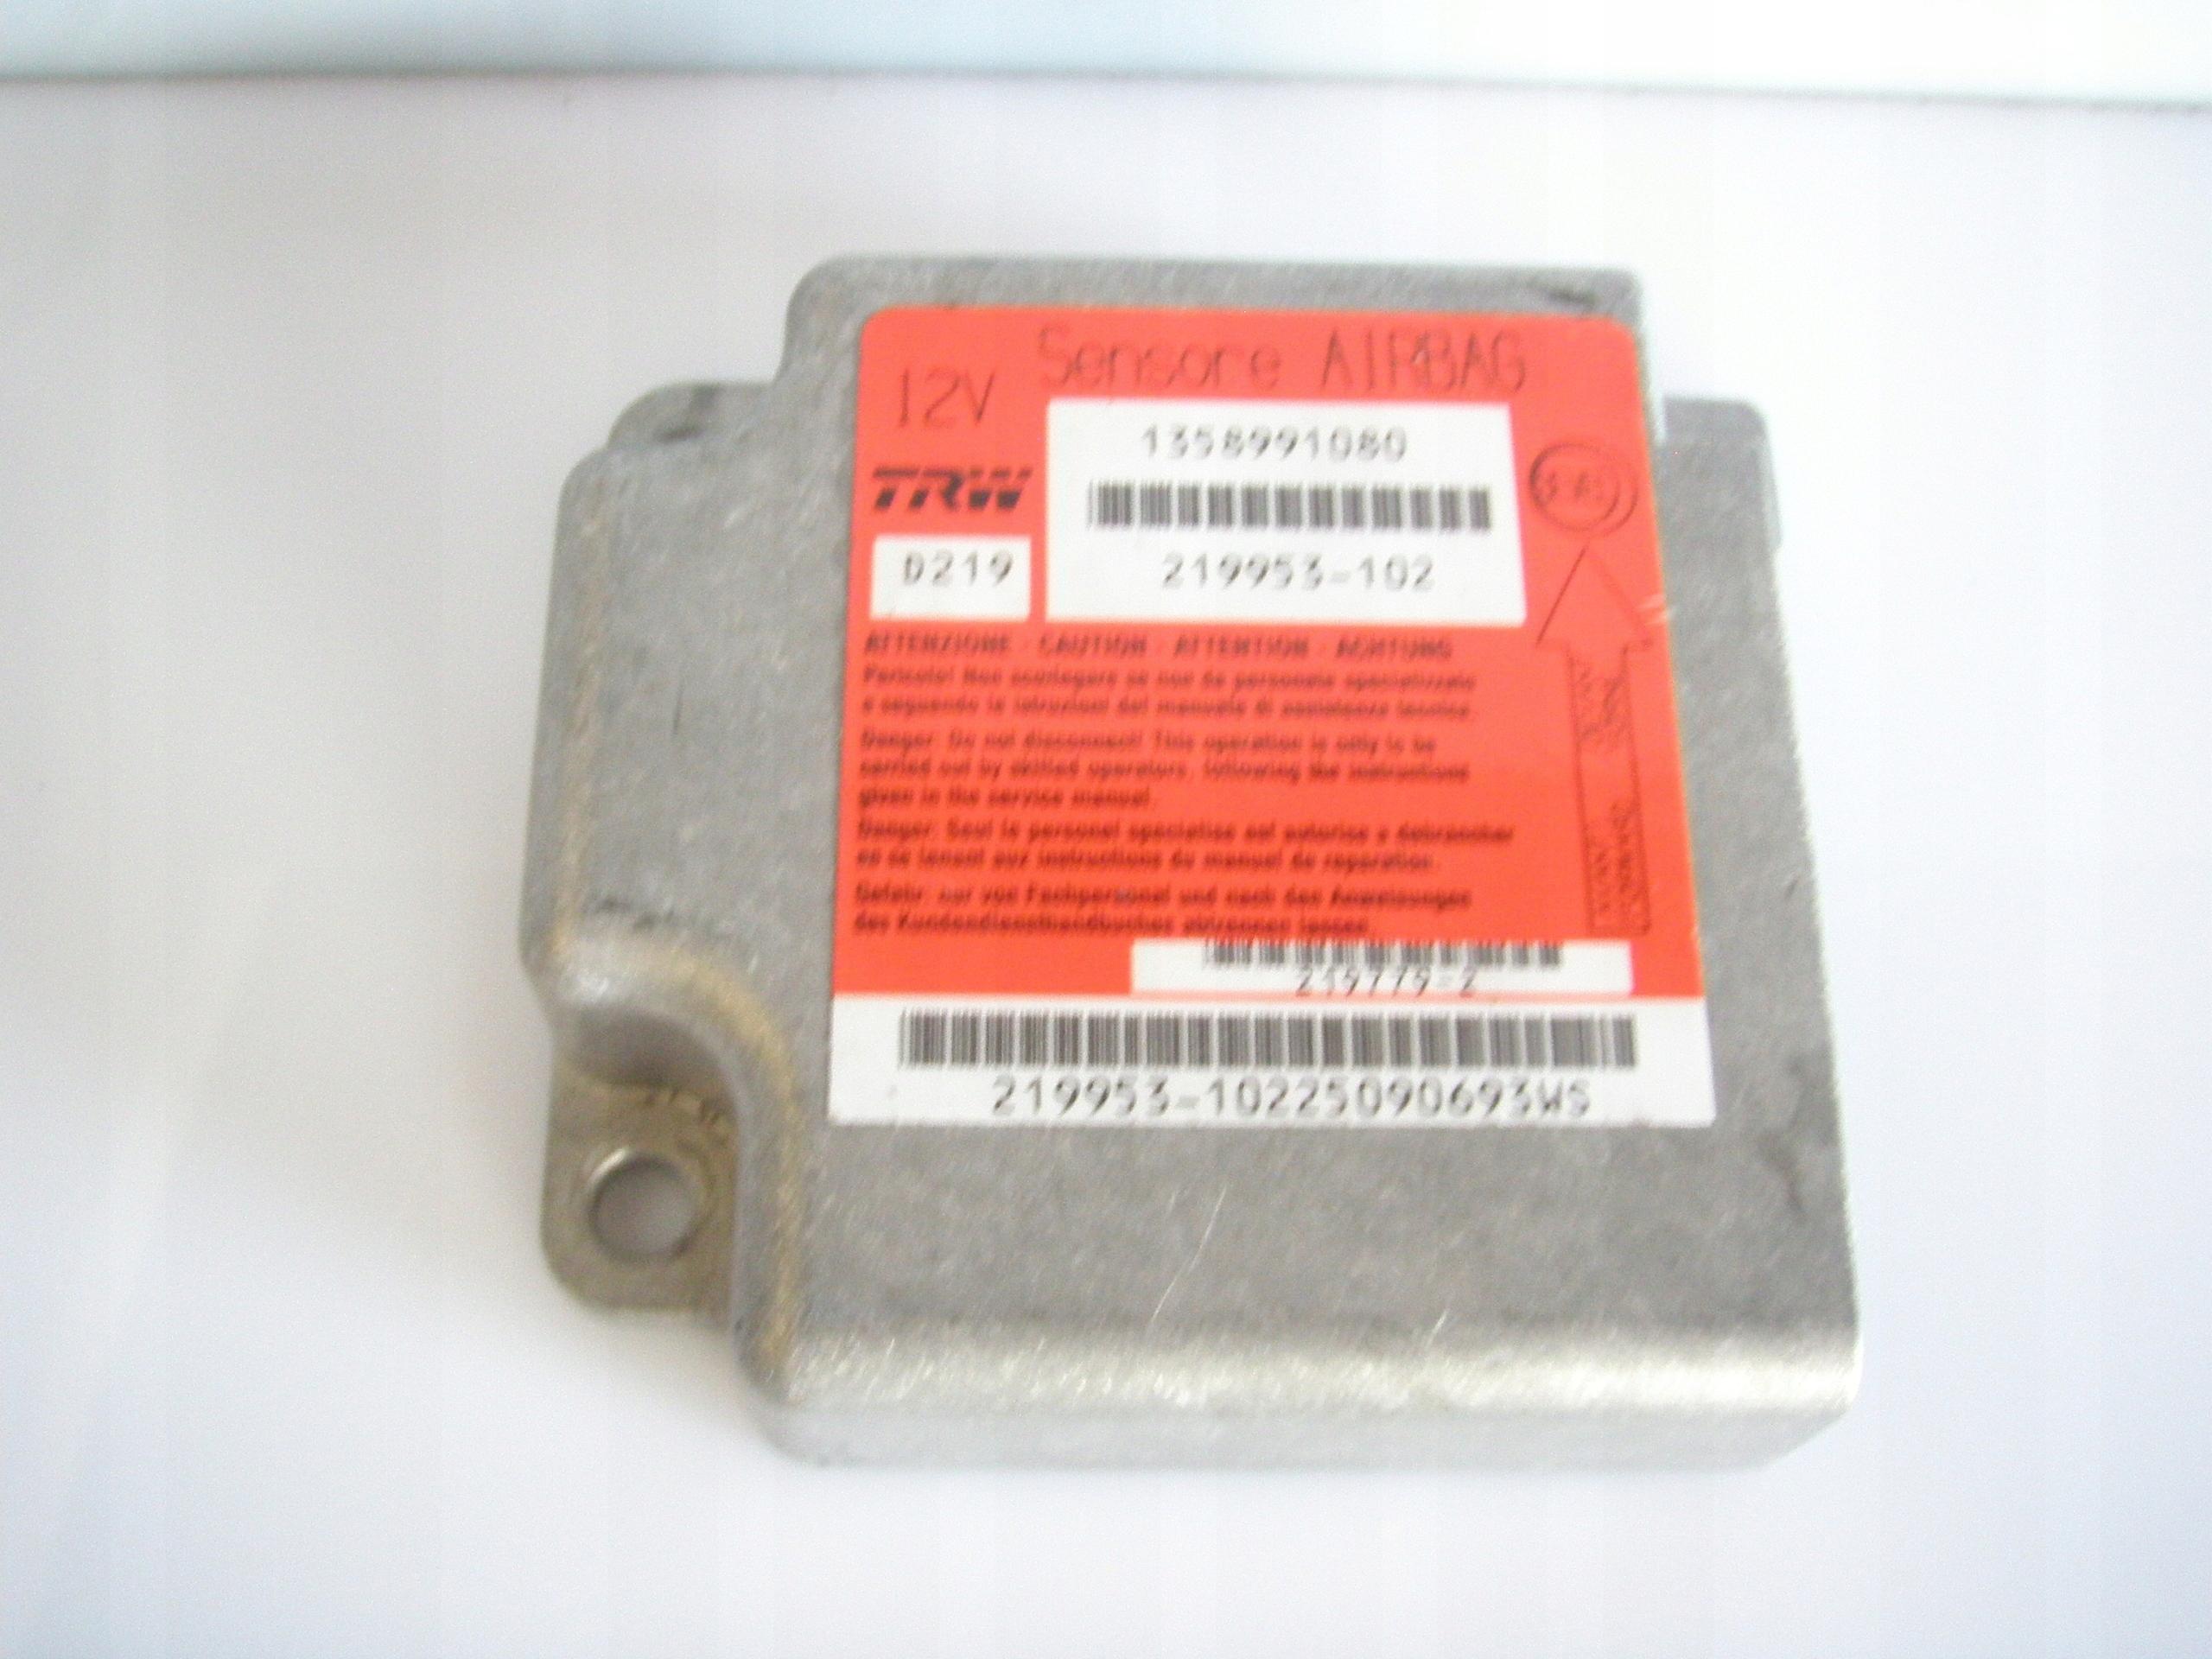 Sensor Airbag Fiat Ducato 1358991080 7570733614